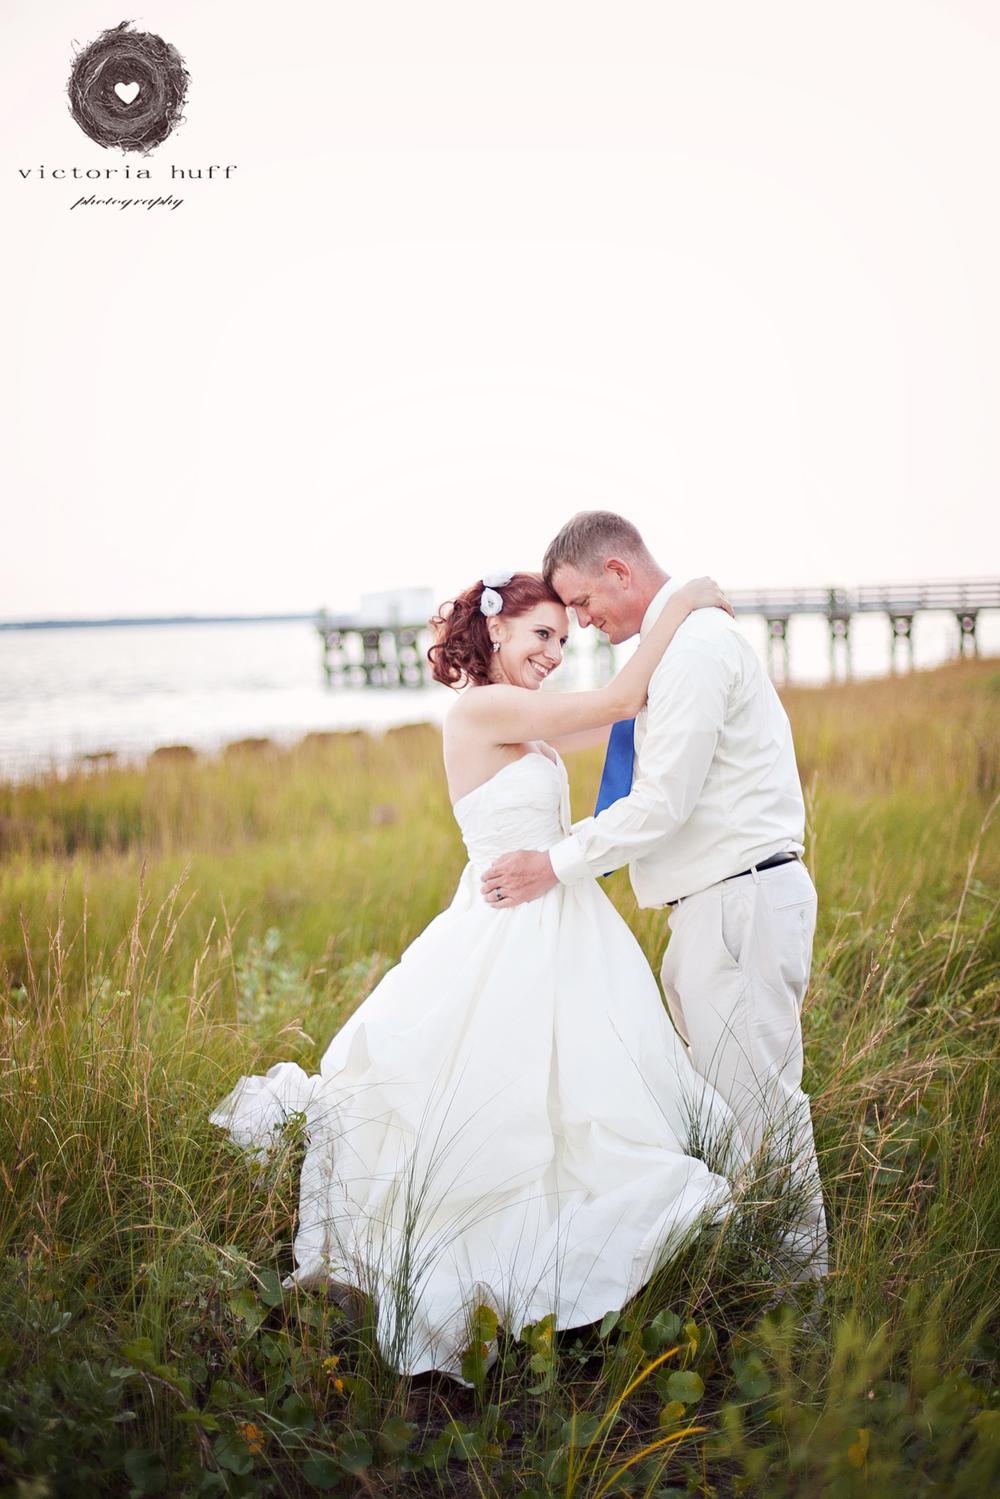 Wedding-Photography-Rachel-Sloane-North-Carolina-Beach-Wedding-Pier-3.jpg